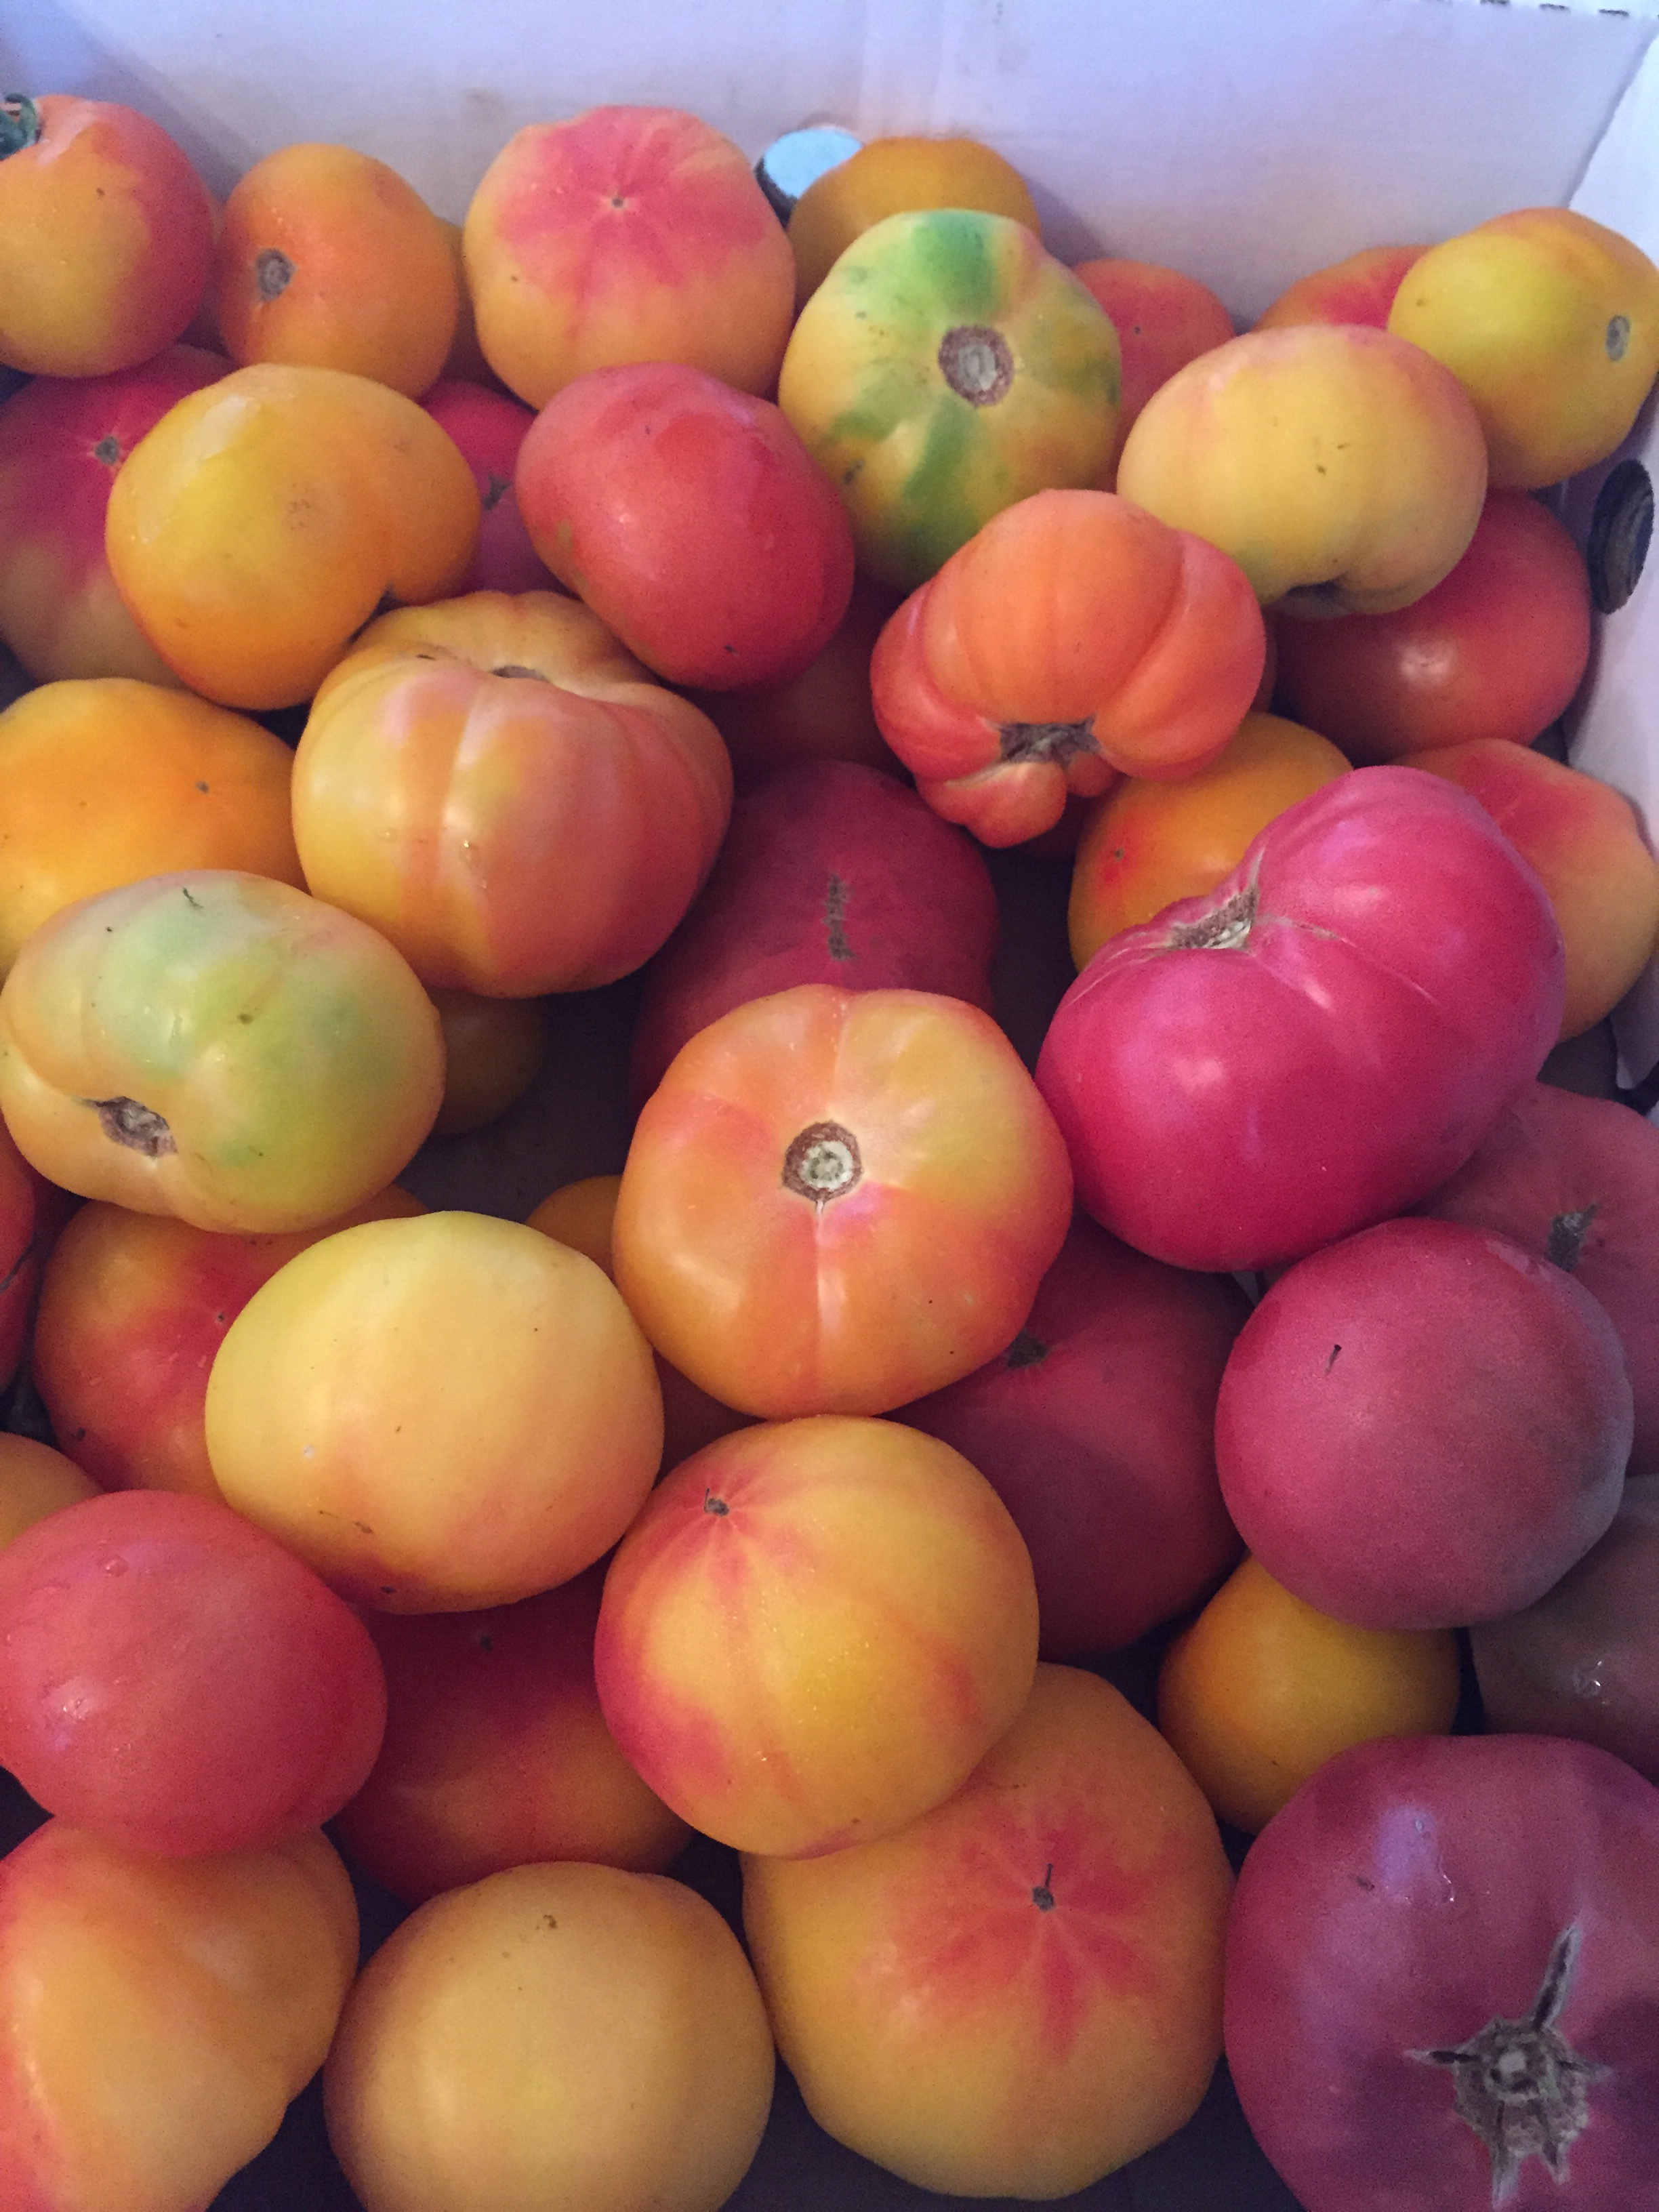 8a01f3979602cd4ee084_baeeb3553e2c90dec566_tomatos.jpg